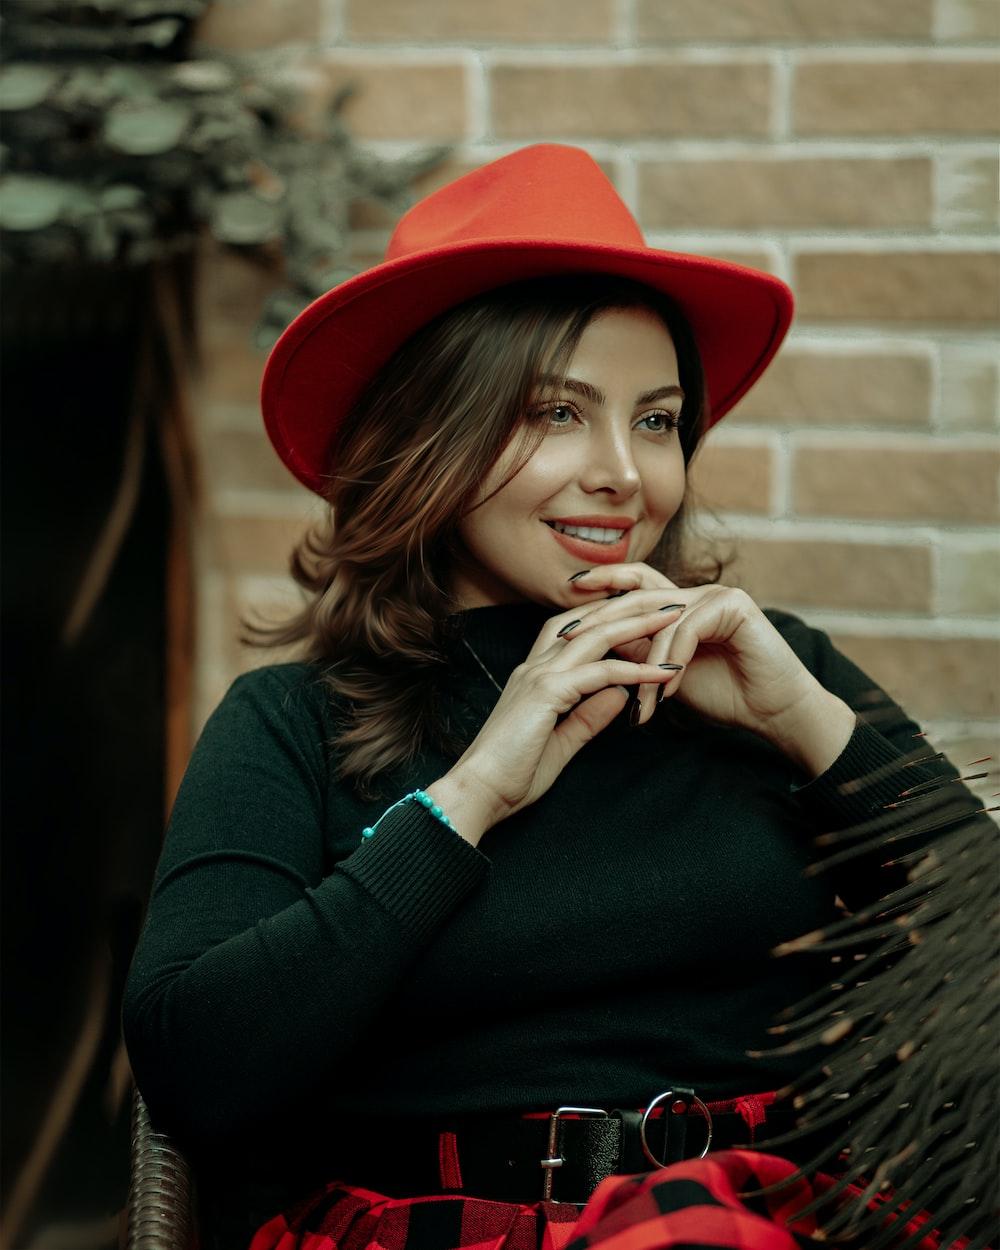 woman in black long sleeve shirt wearing red hat